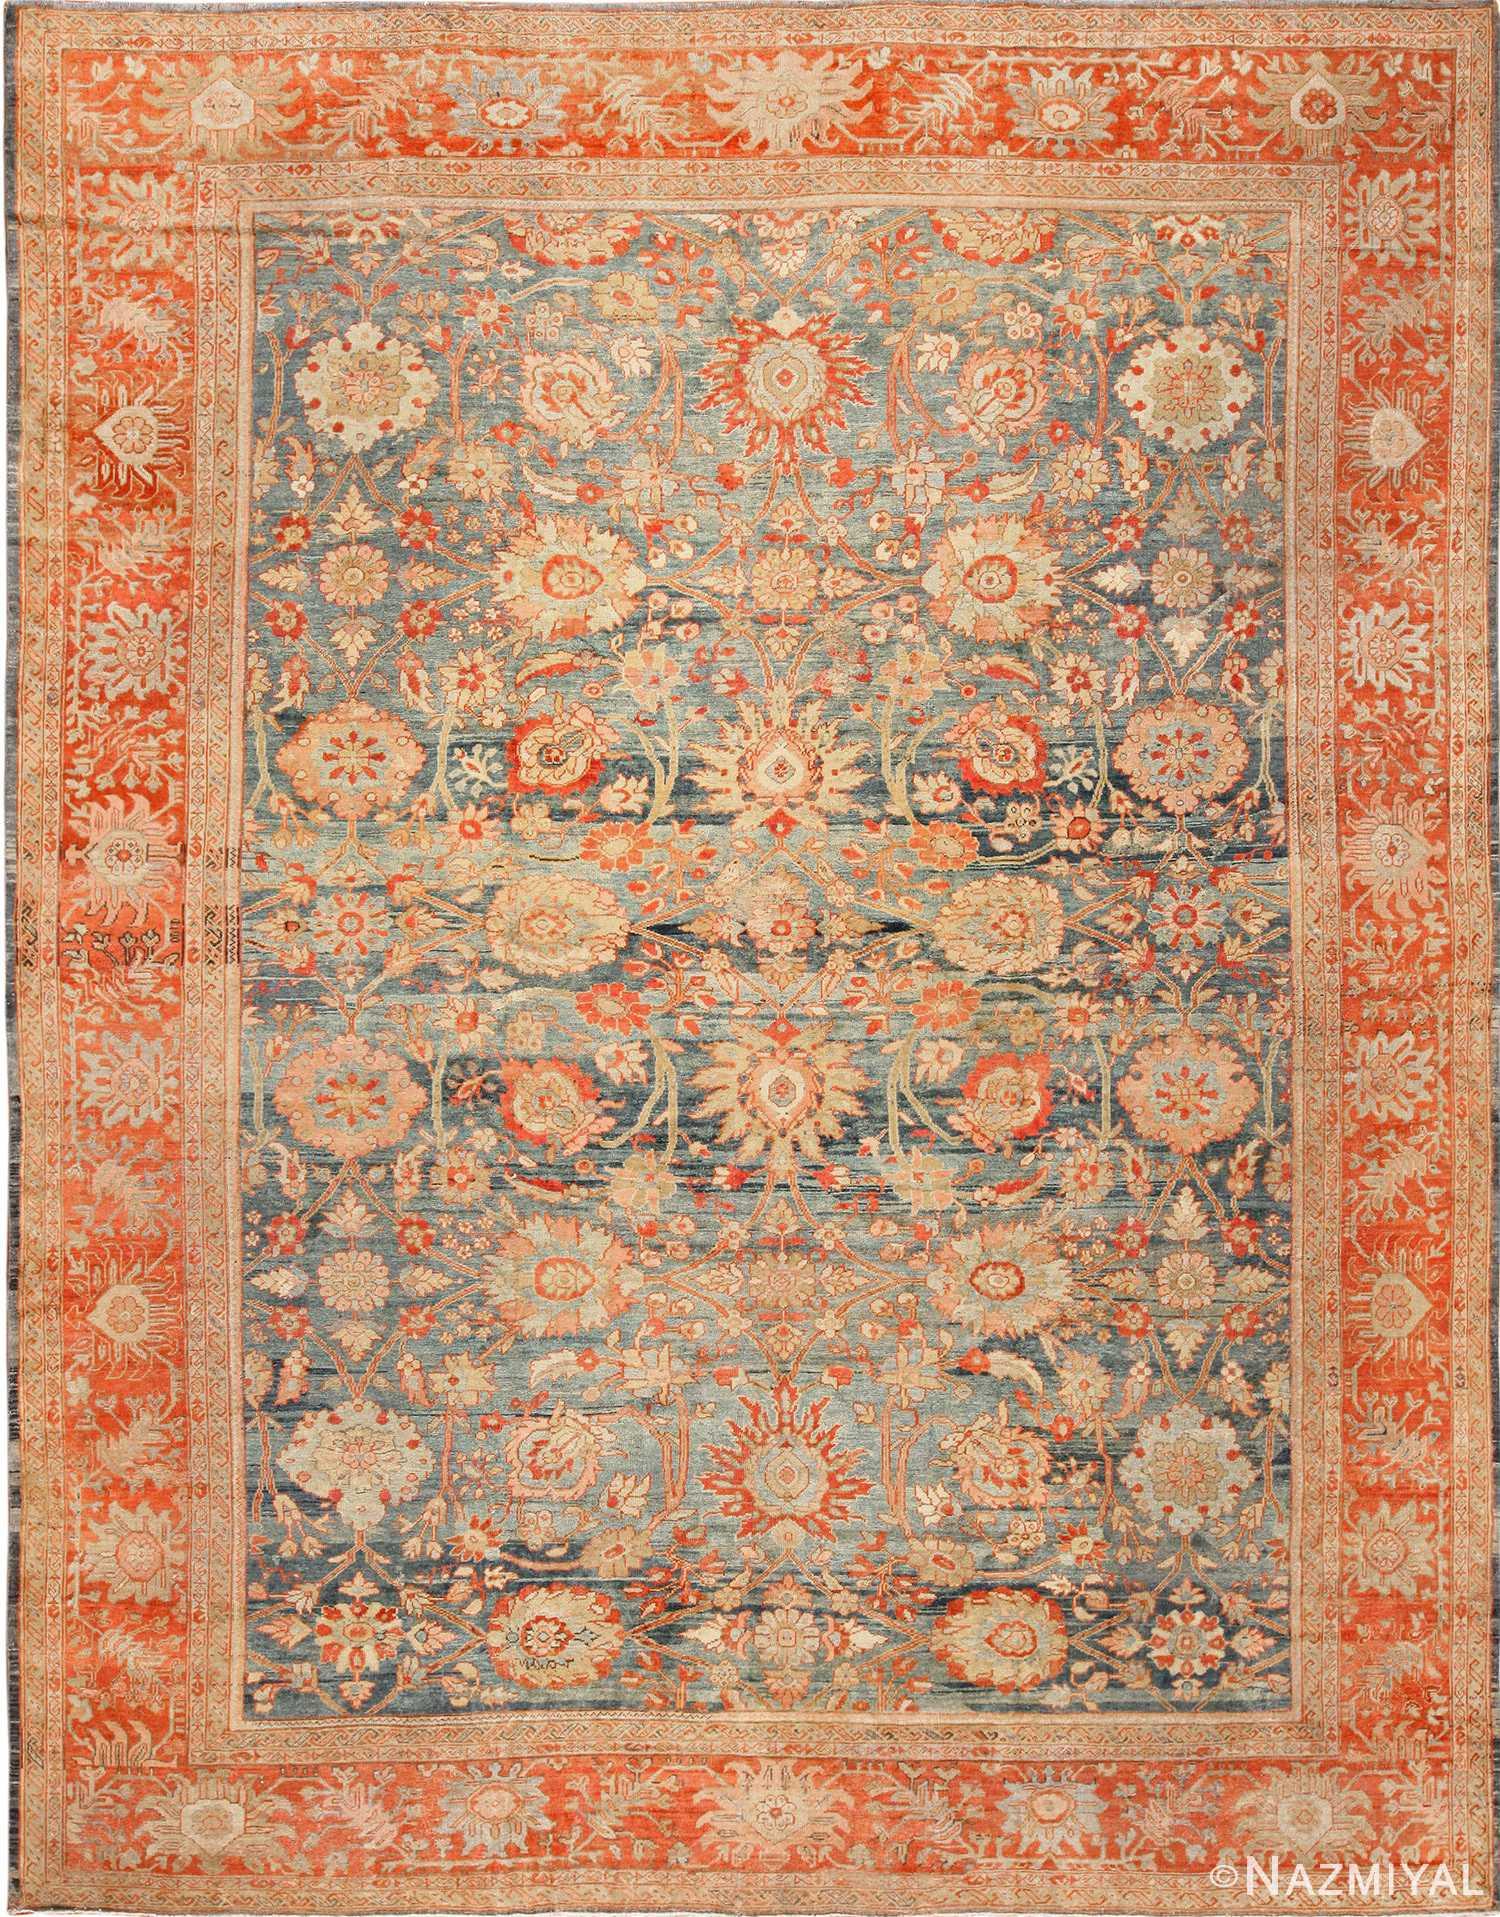 blue background antique sultanabad persian rug 49320 Nazmiyal